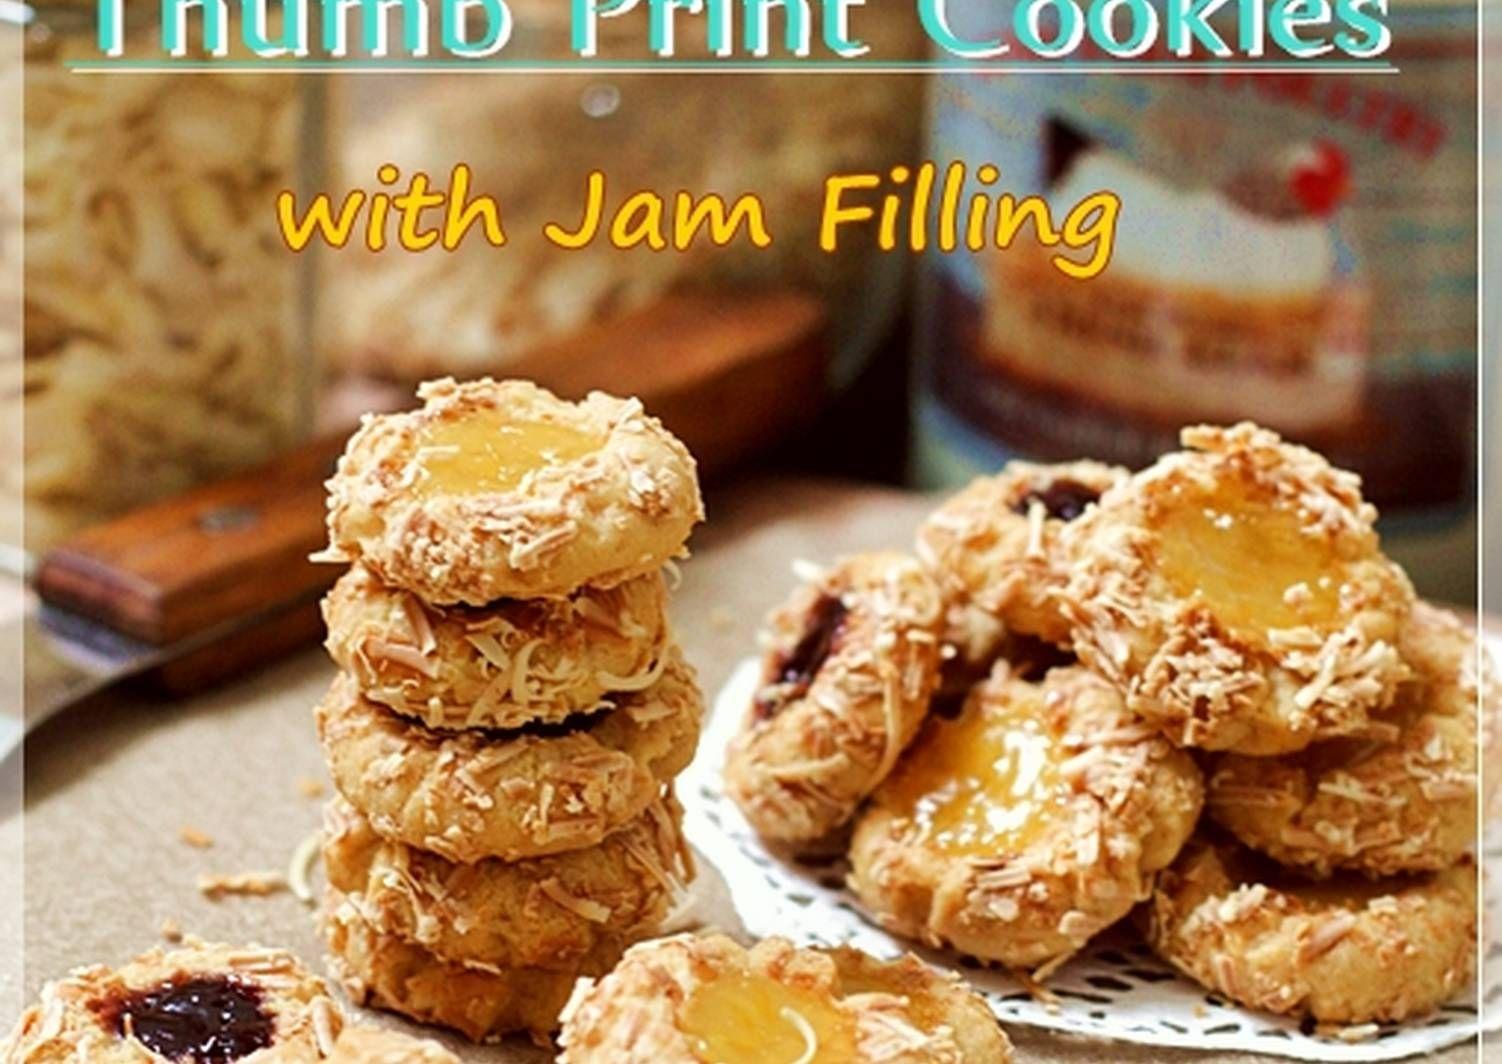 Resep Blueberry Lemon Thumbprint Cookies With Cheese Super Nagih Oleh Tintin Rayner Resep Makanan Resep Resep Biskuit